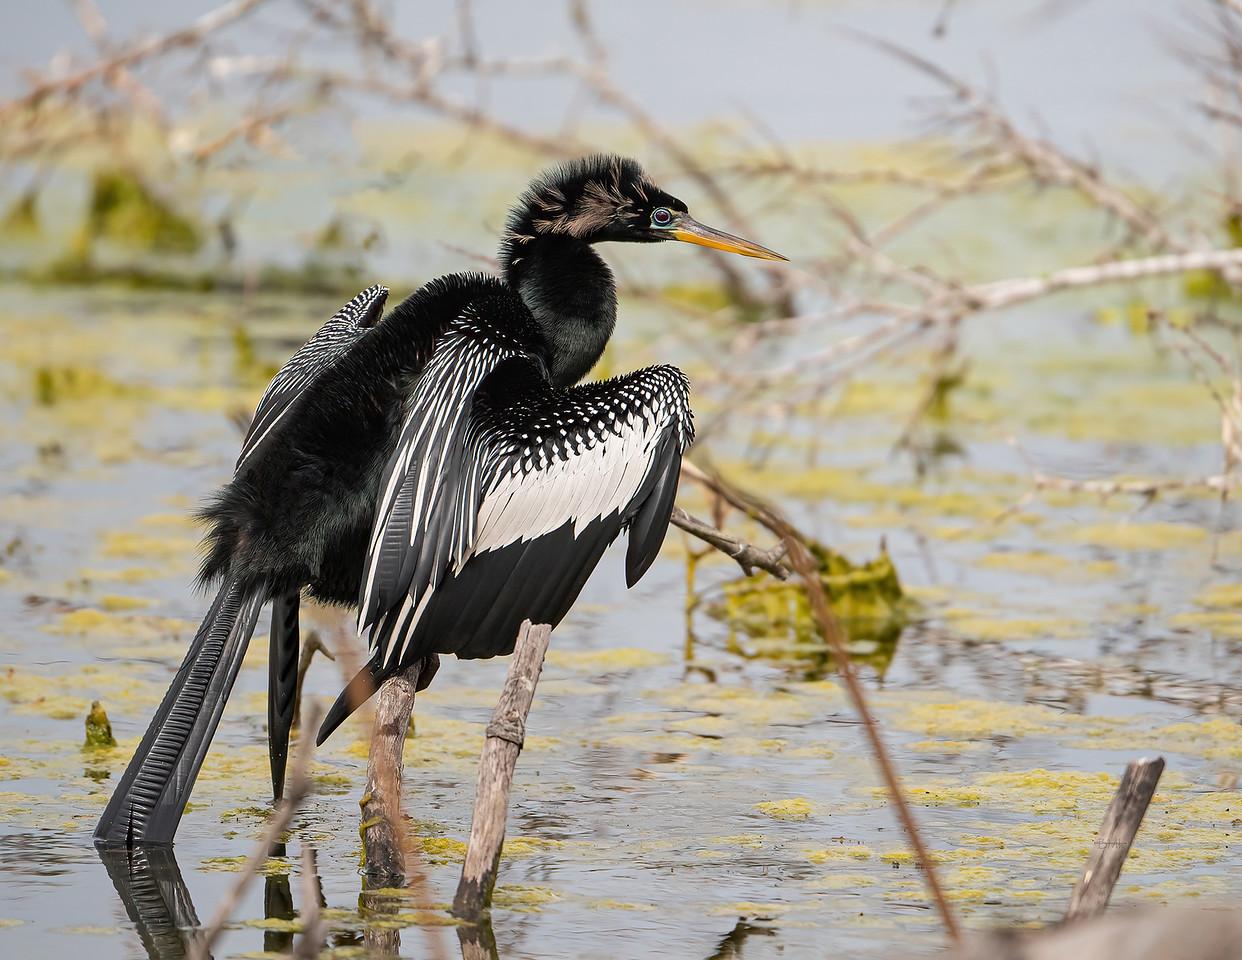 IMAGE: https://photos.smugmug.com/Beautyinthetreesandintheair/Swimming-birds/i-fFpR4Mf/2/ddaf955a/X2/Anhinga_9_3-10-21-8%20RS-X2.jpg